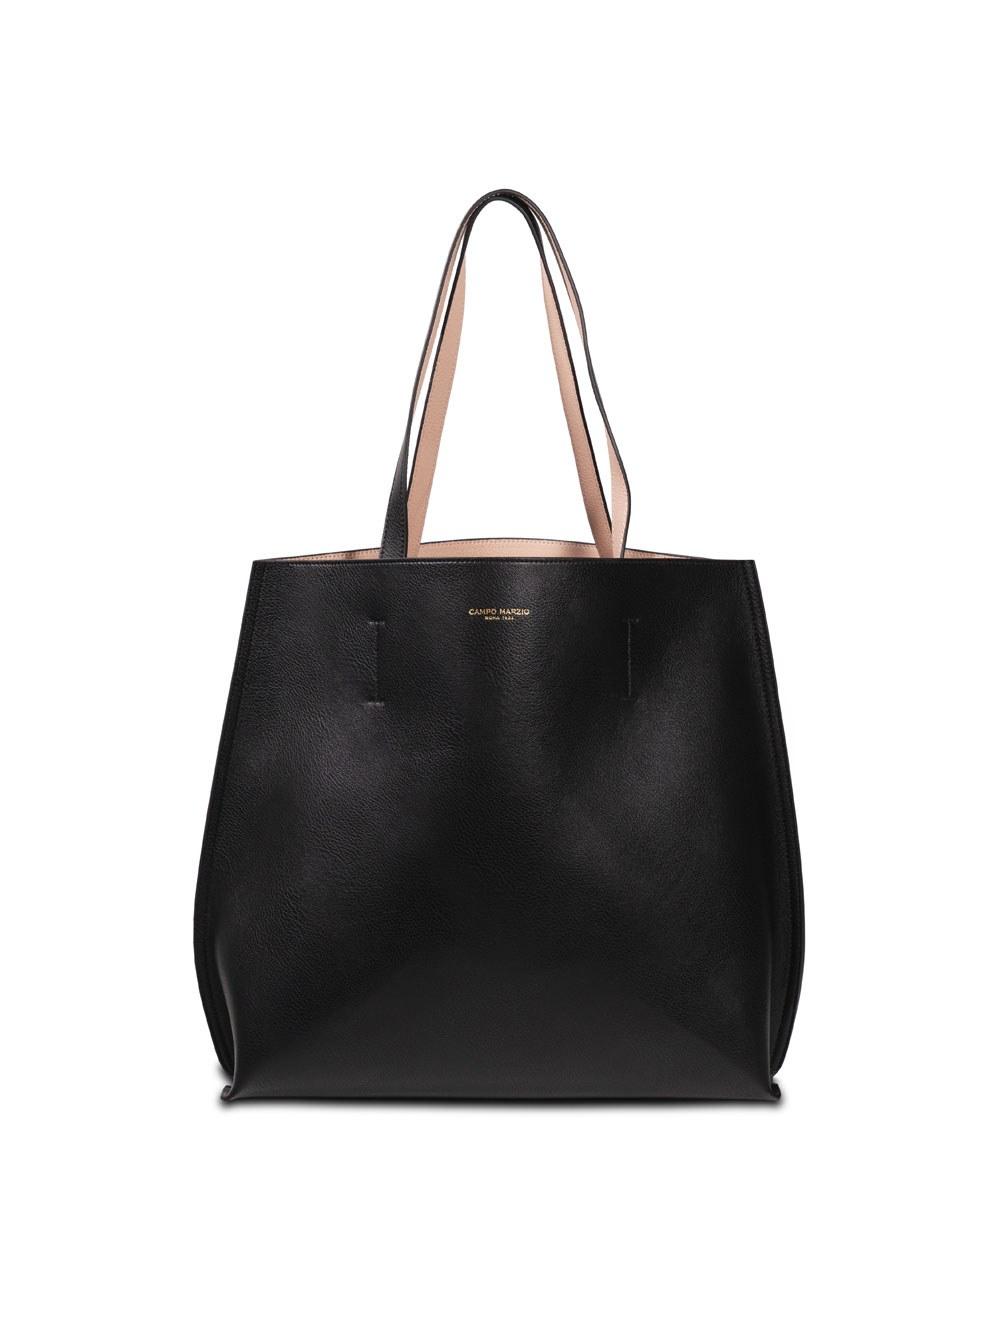 Double Tote Bag - Black